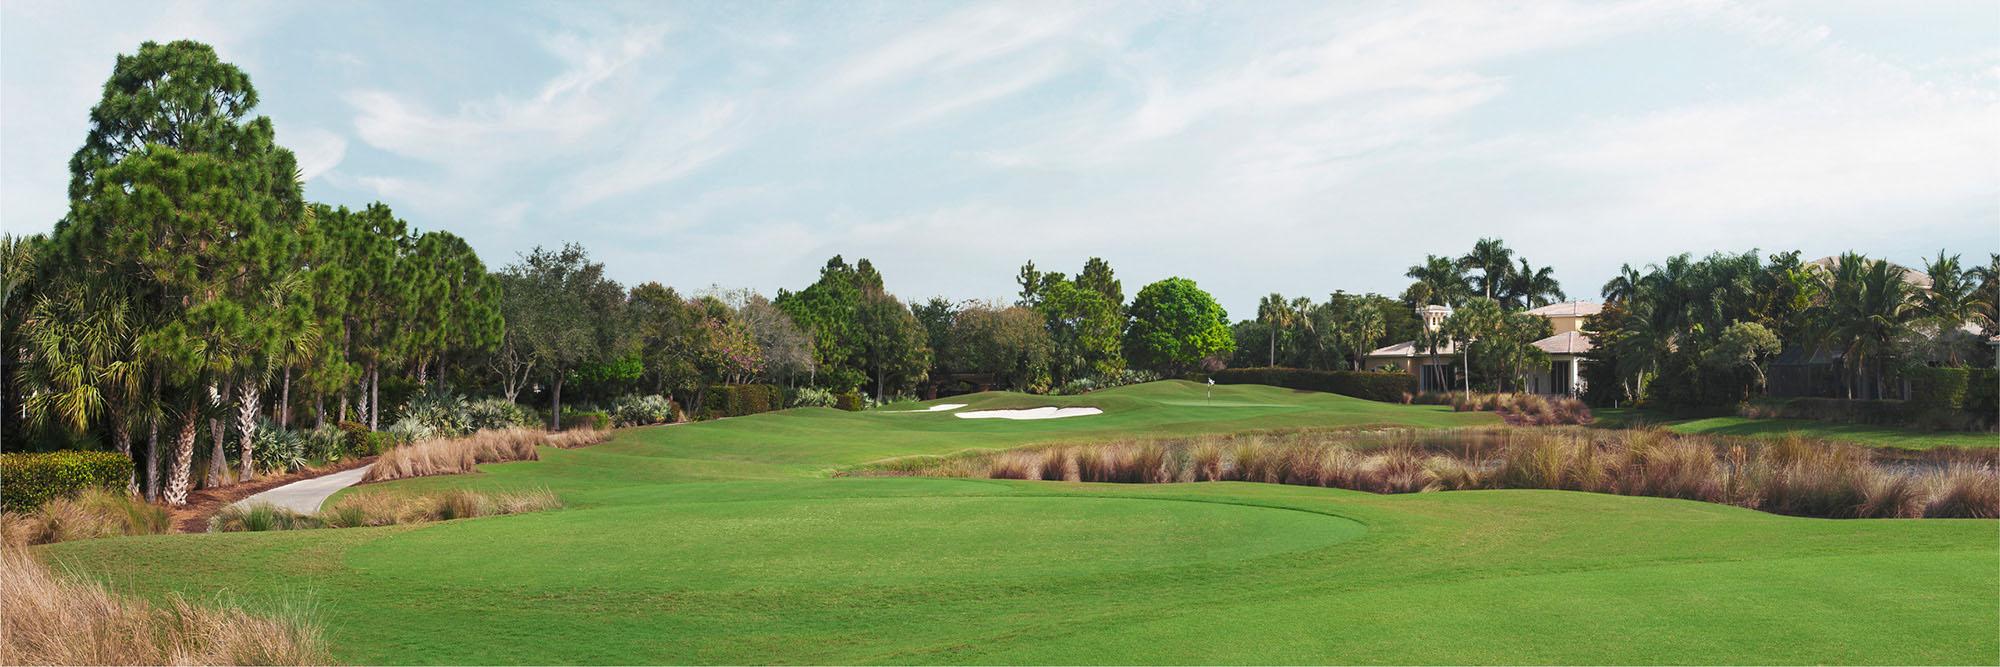 Golf Course Image - Mirasol Sunset No. 6